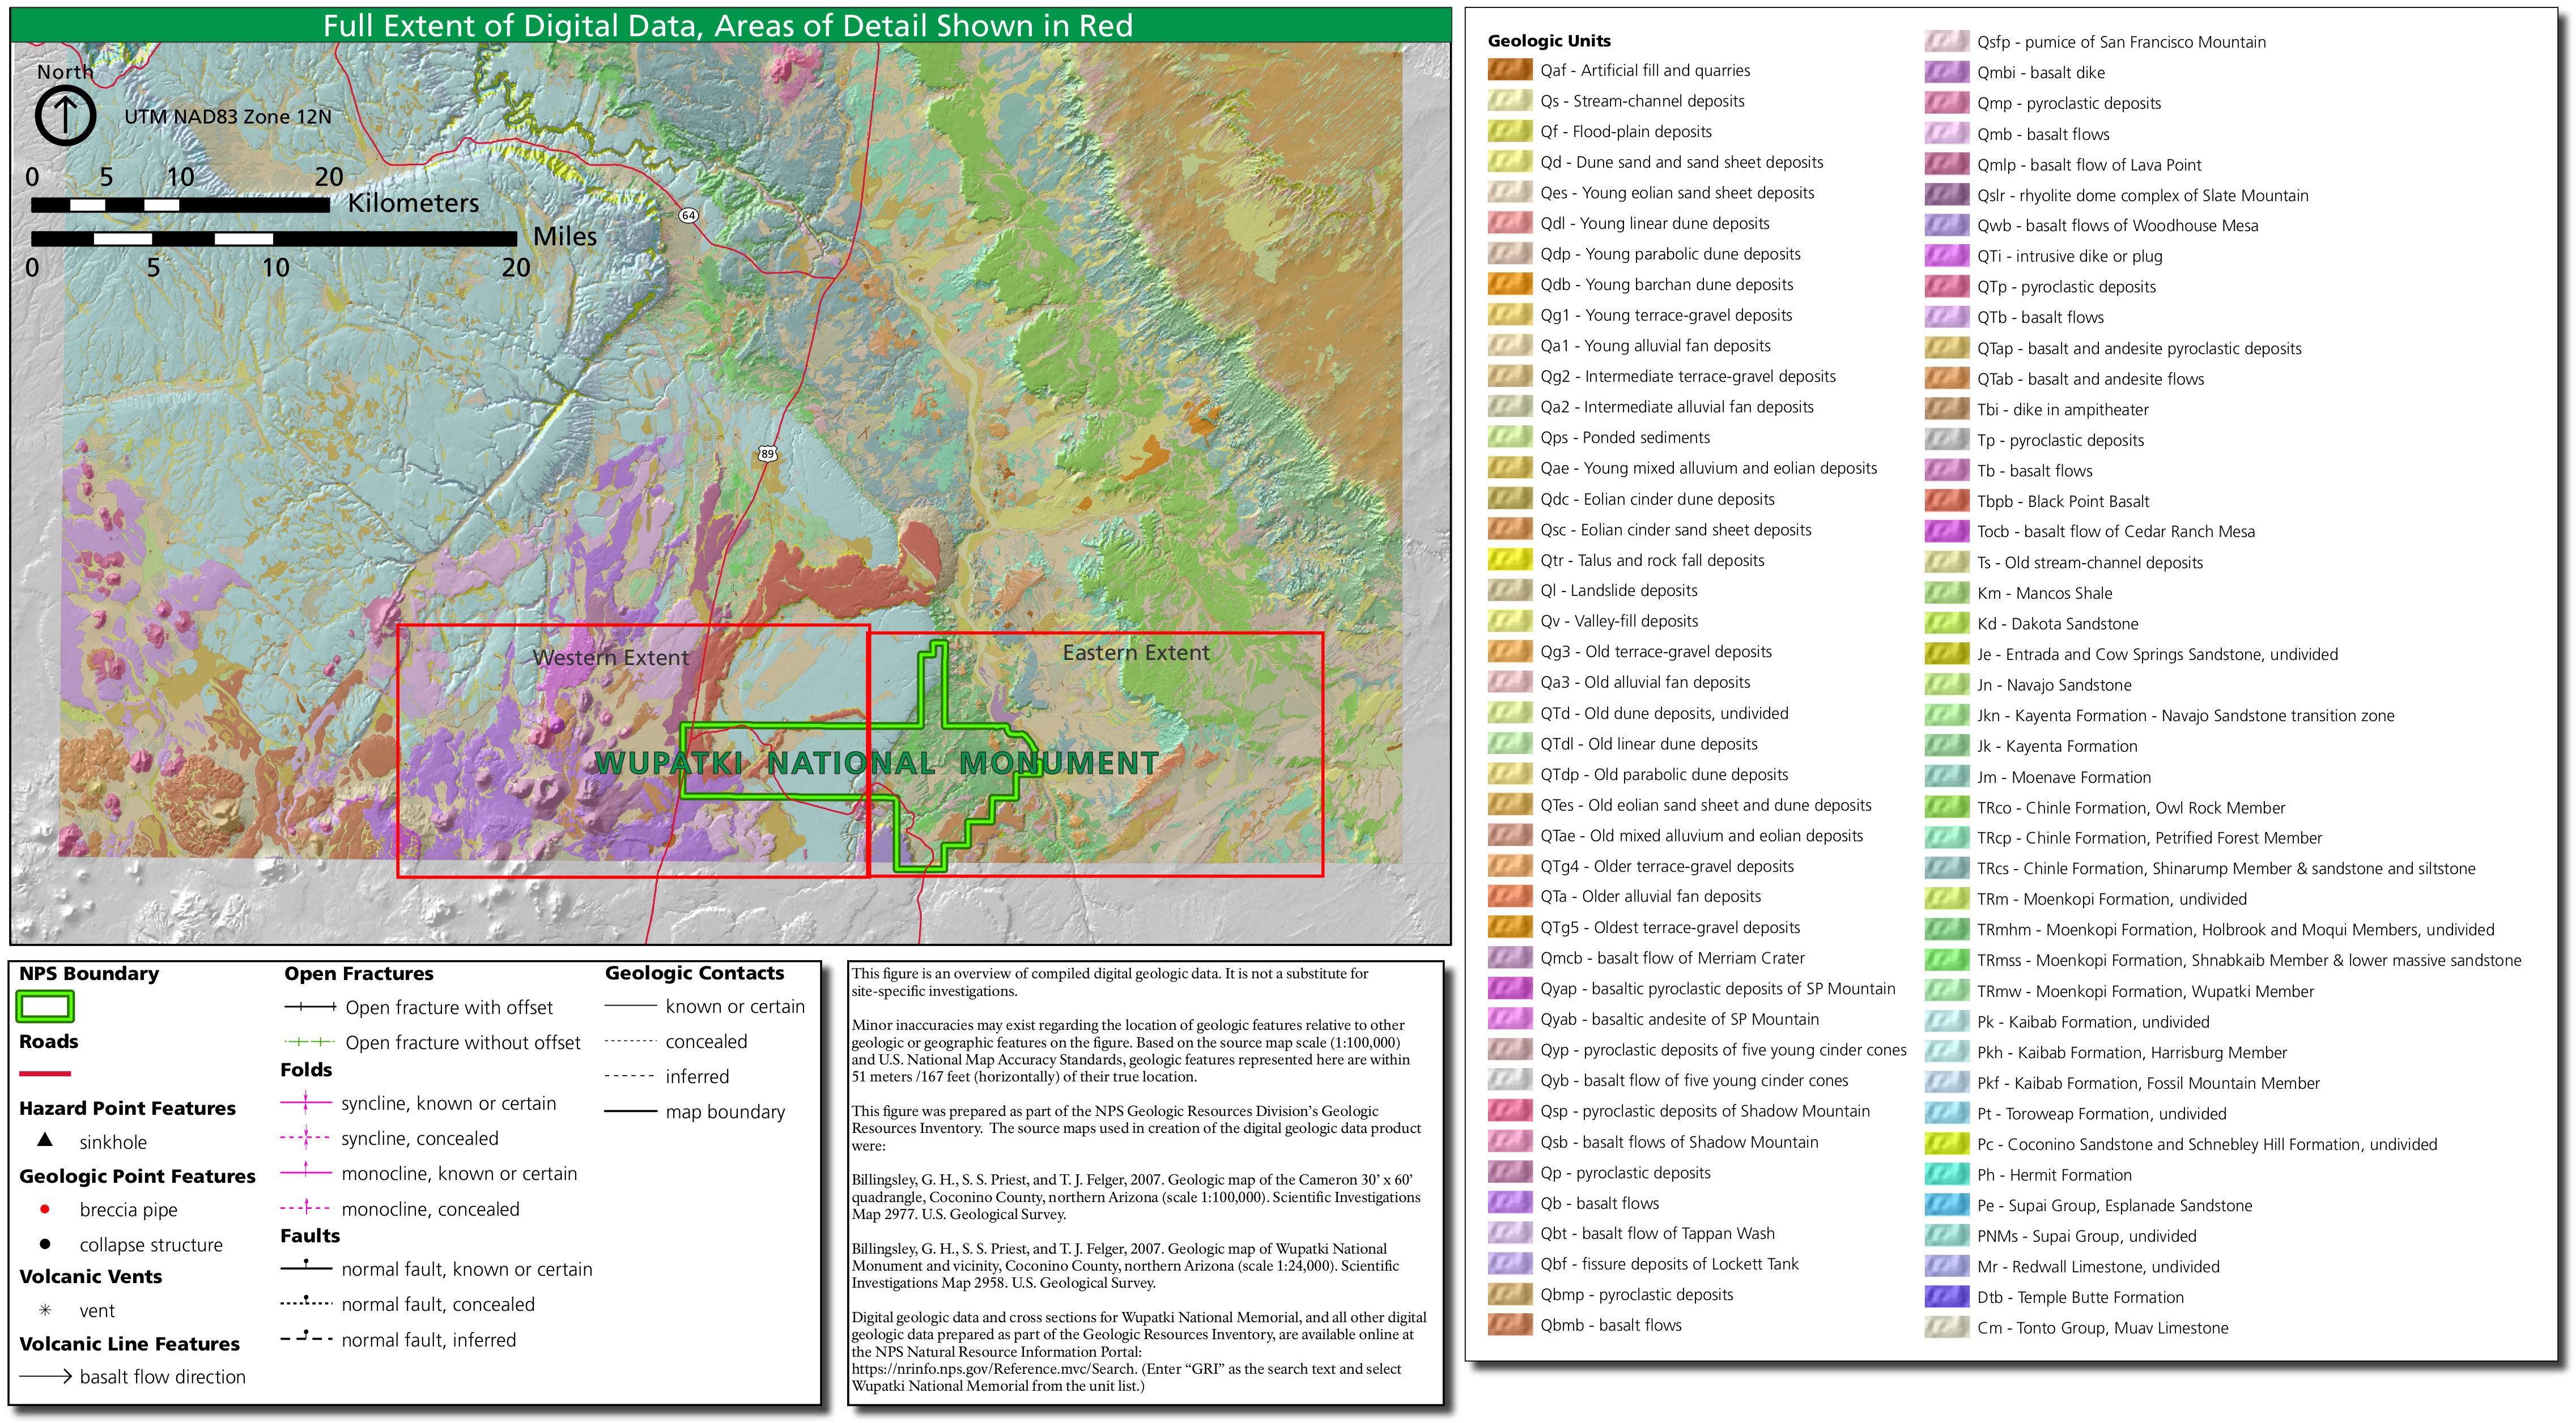 Geologic Map Of Arizona.File Nps Wupatki Geologic Map Overview Jpg Wikimedia Commons